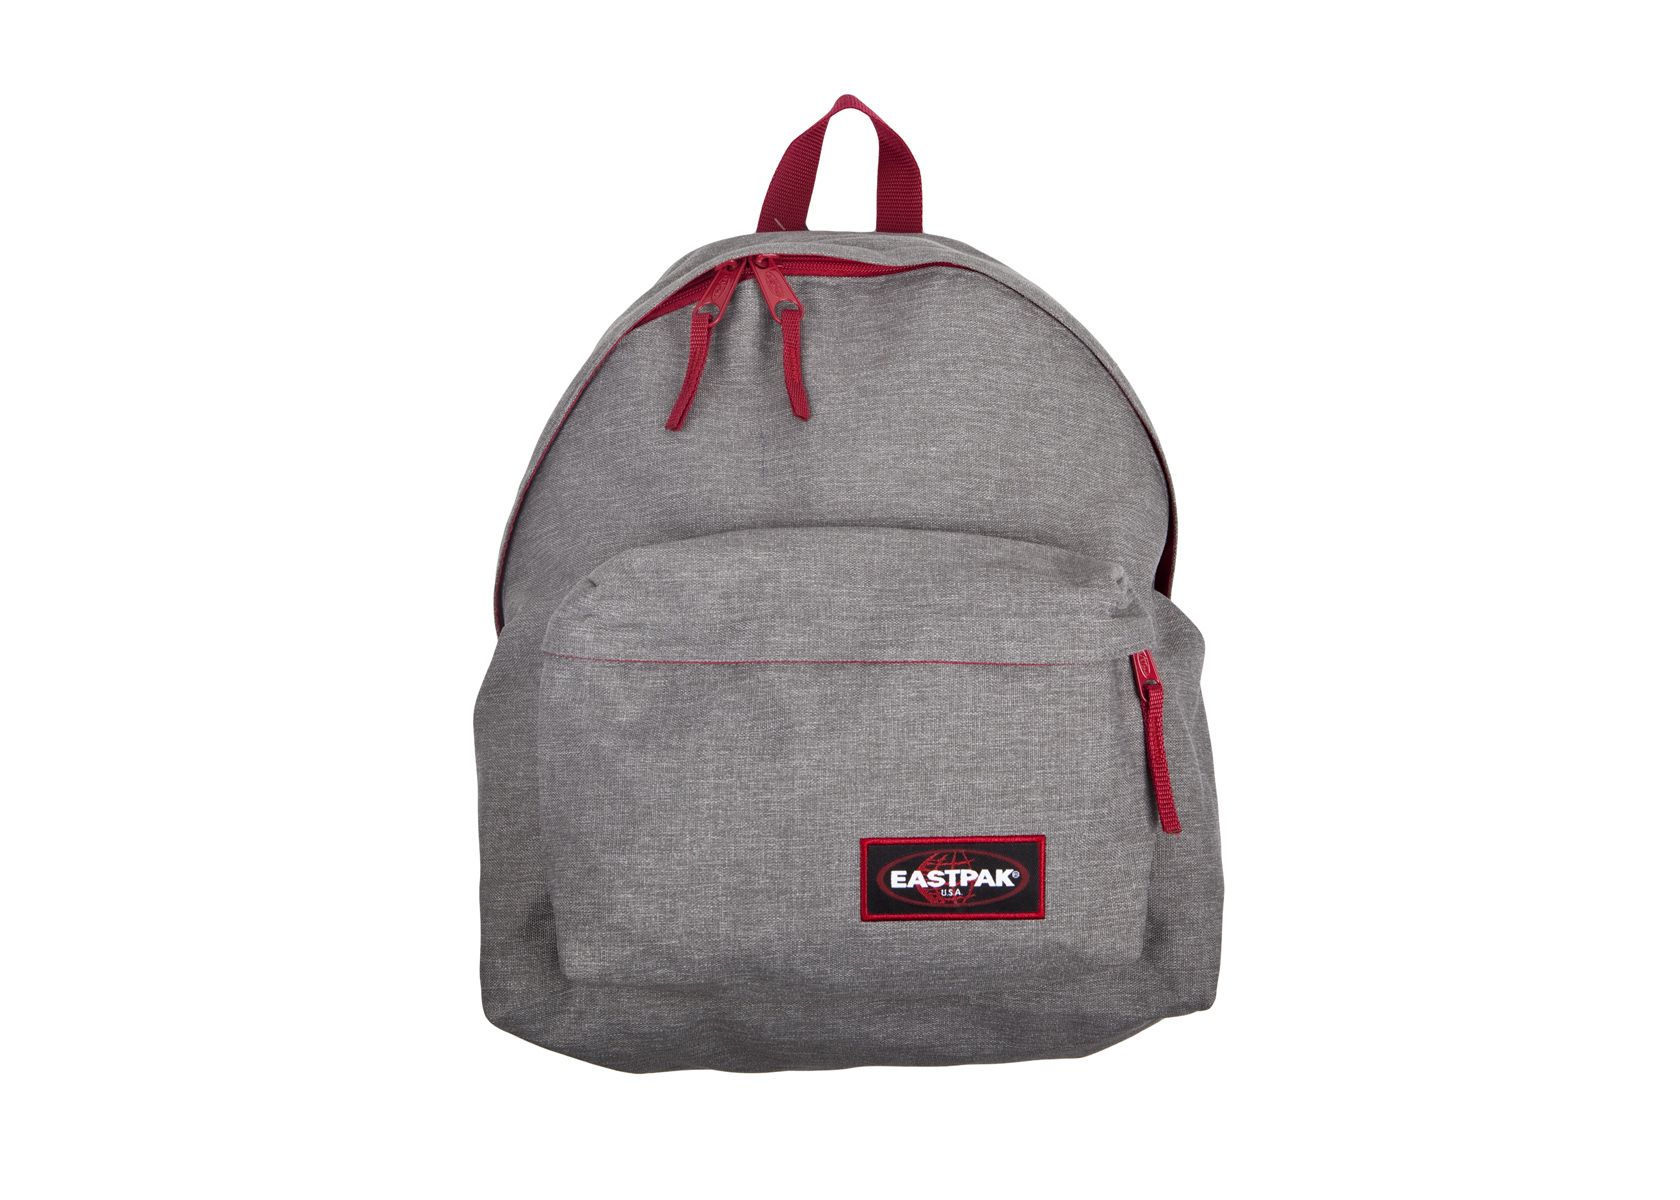 Eastpak - Grey school bag